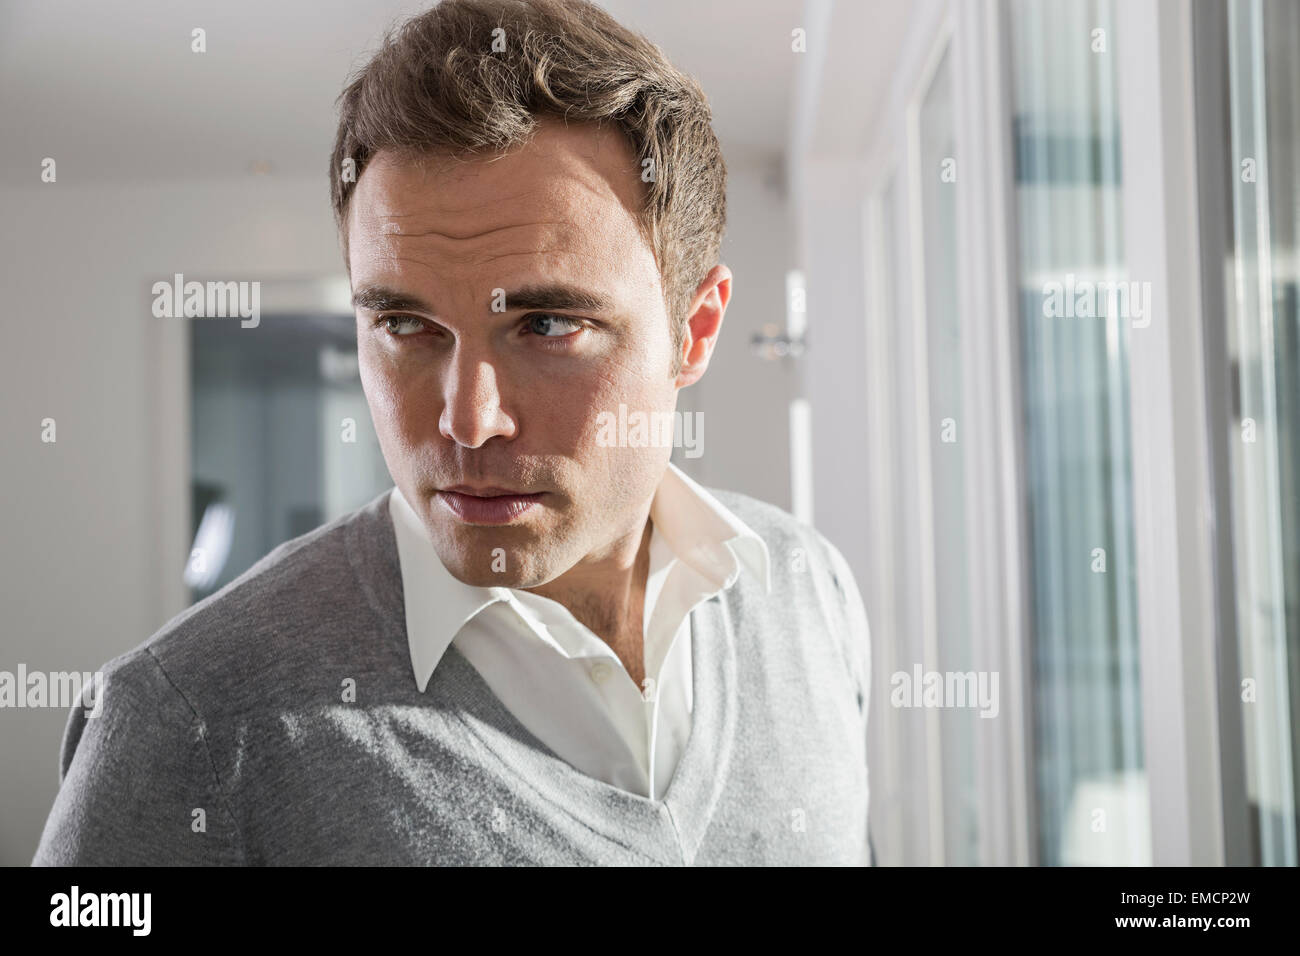 Portrait of man watching something - Stock Image